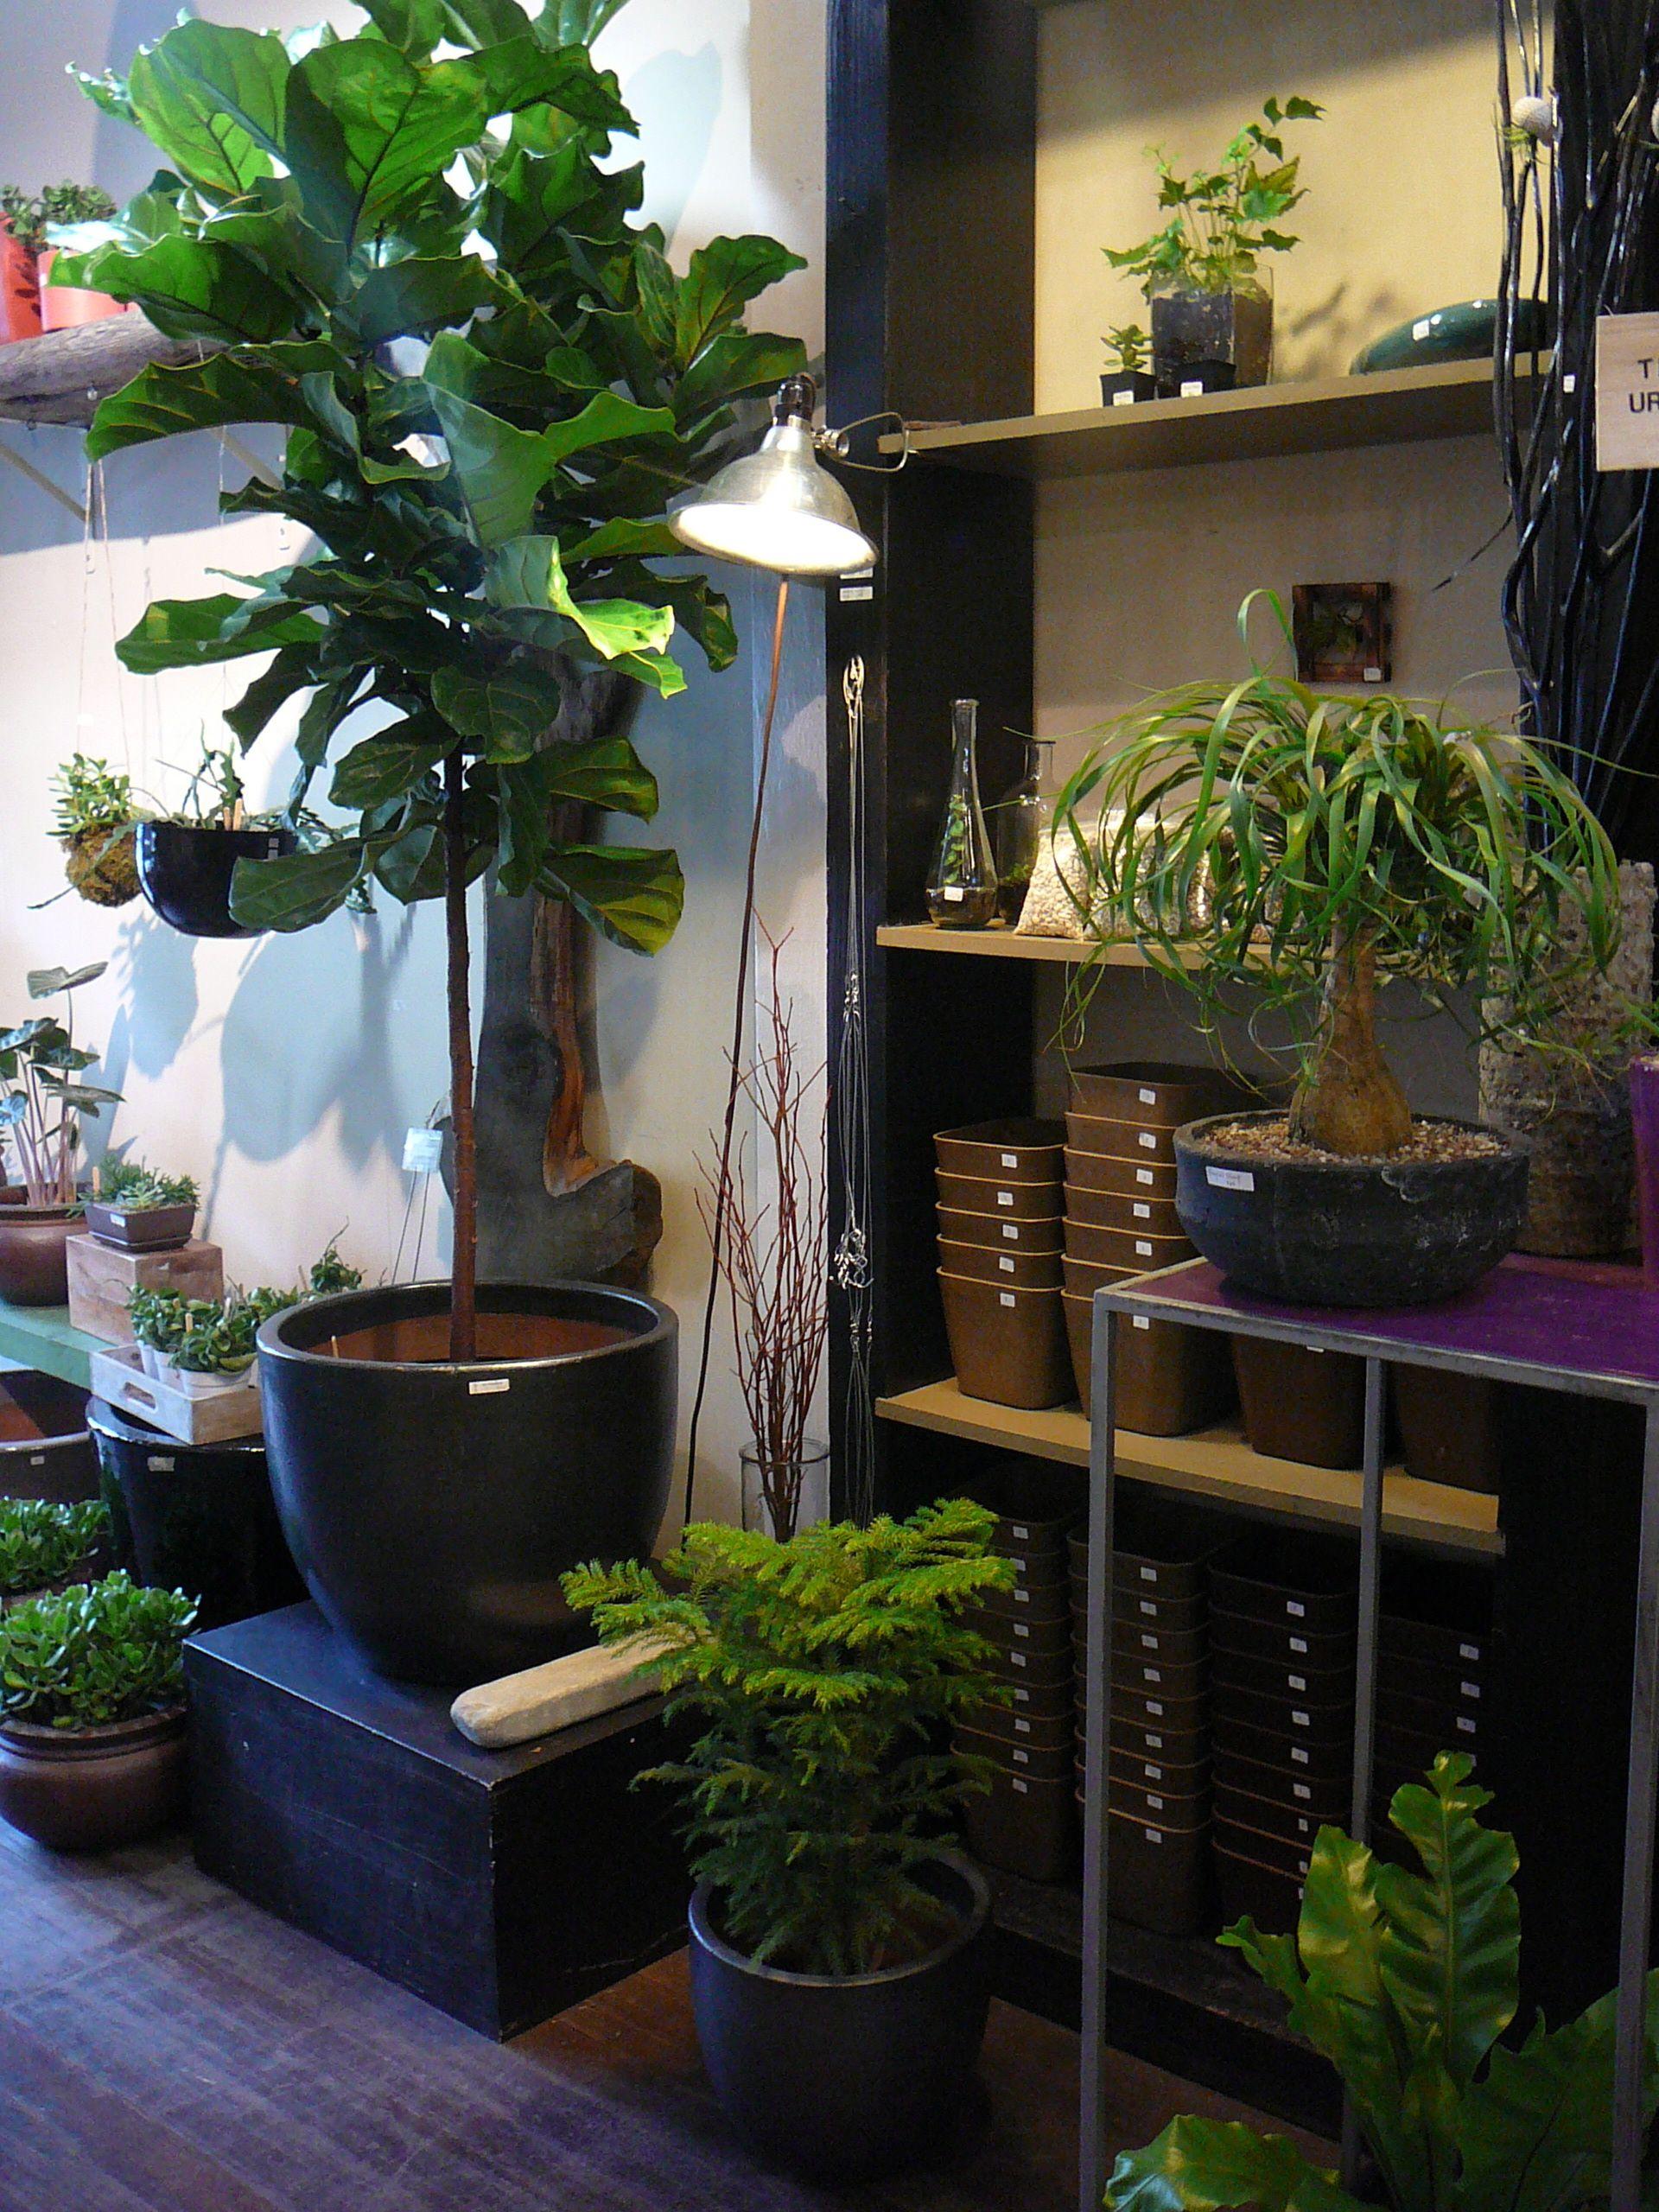 norfolk pine araucaria heterophylla green grow. Black Bedroom Furniture Sets. Home Design Ideas